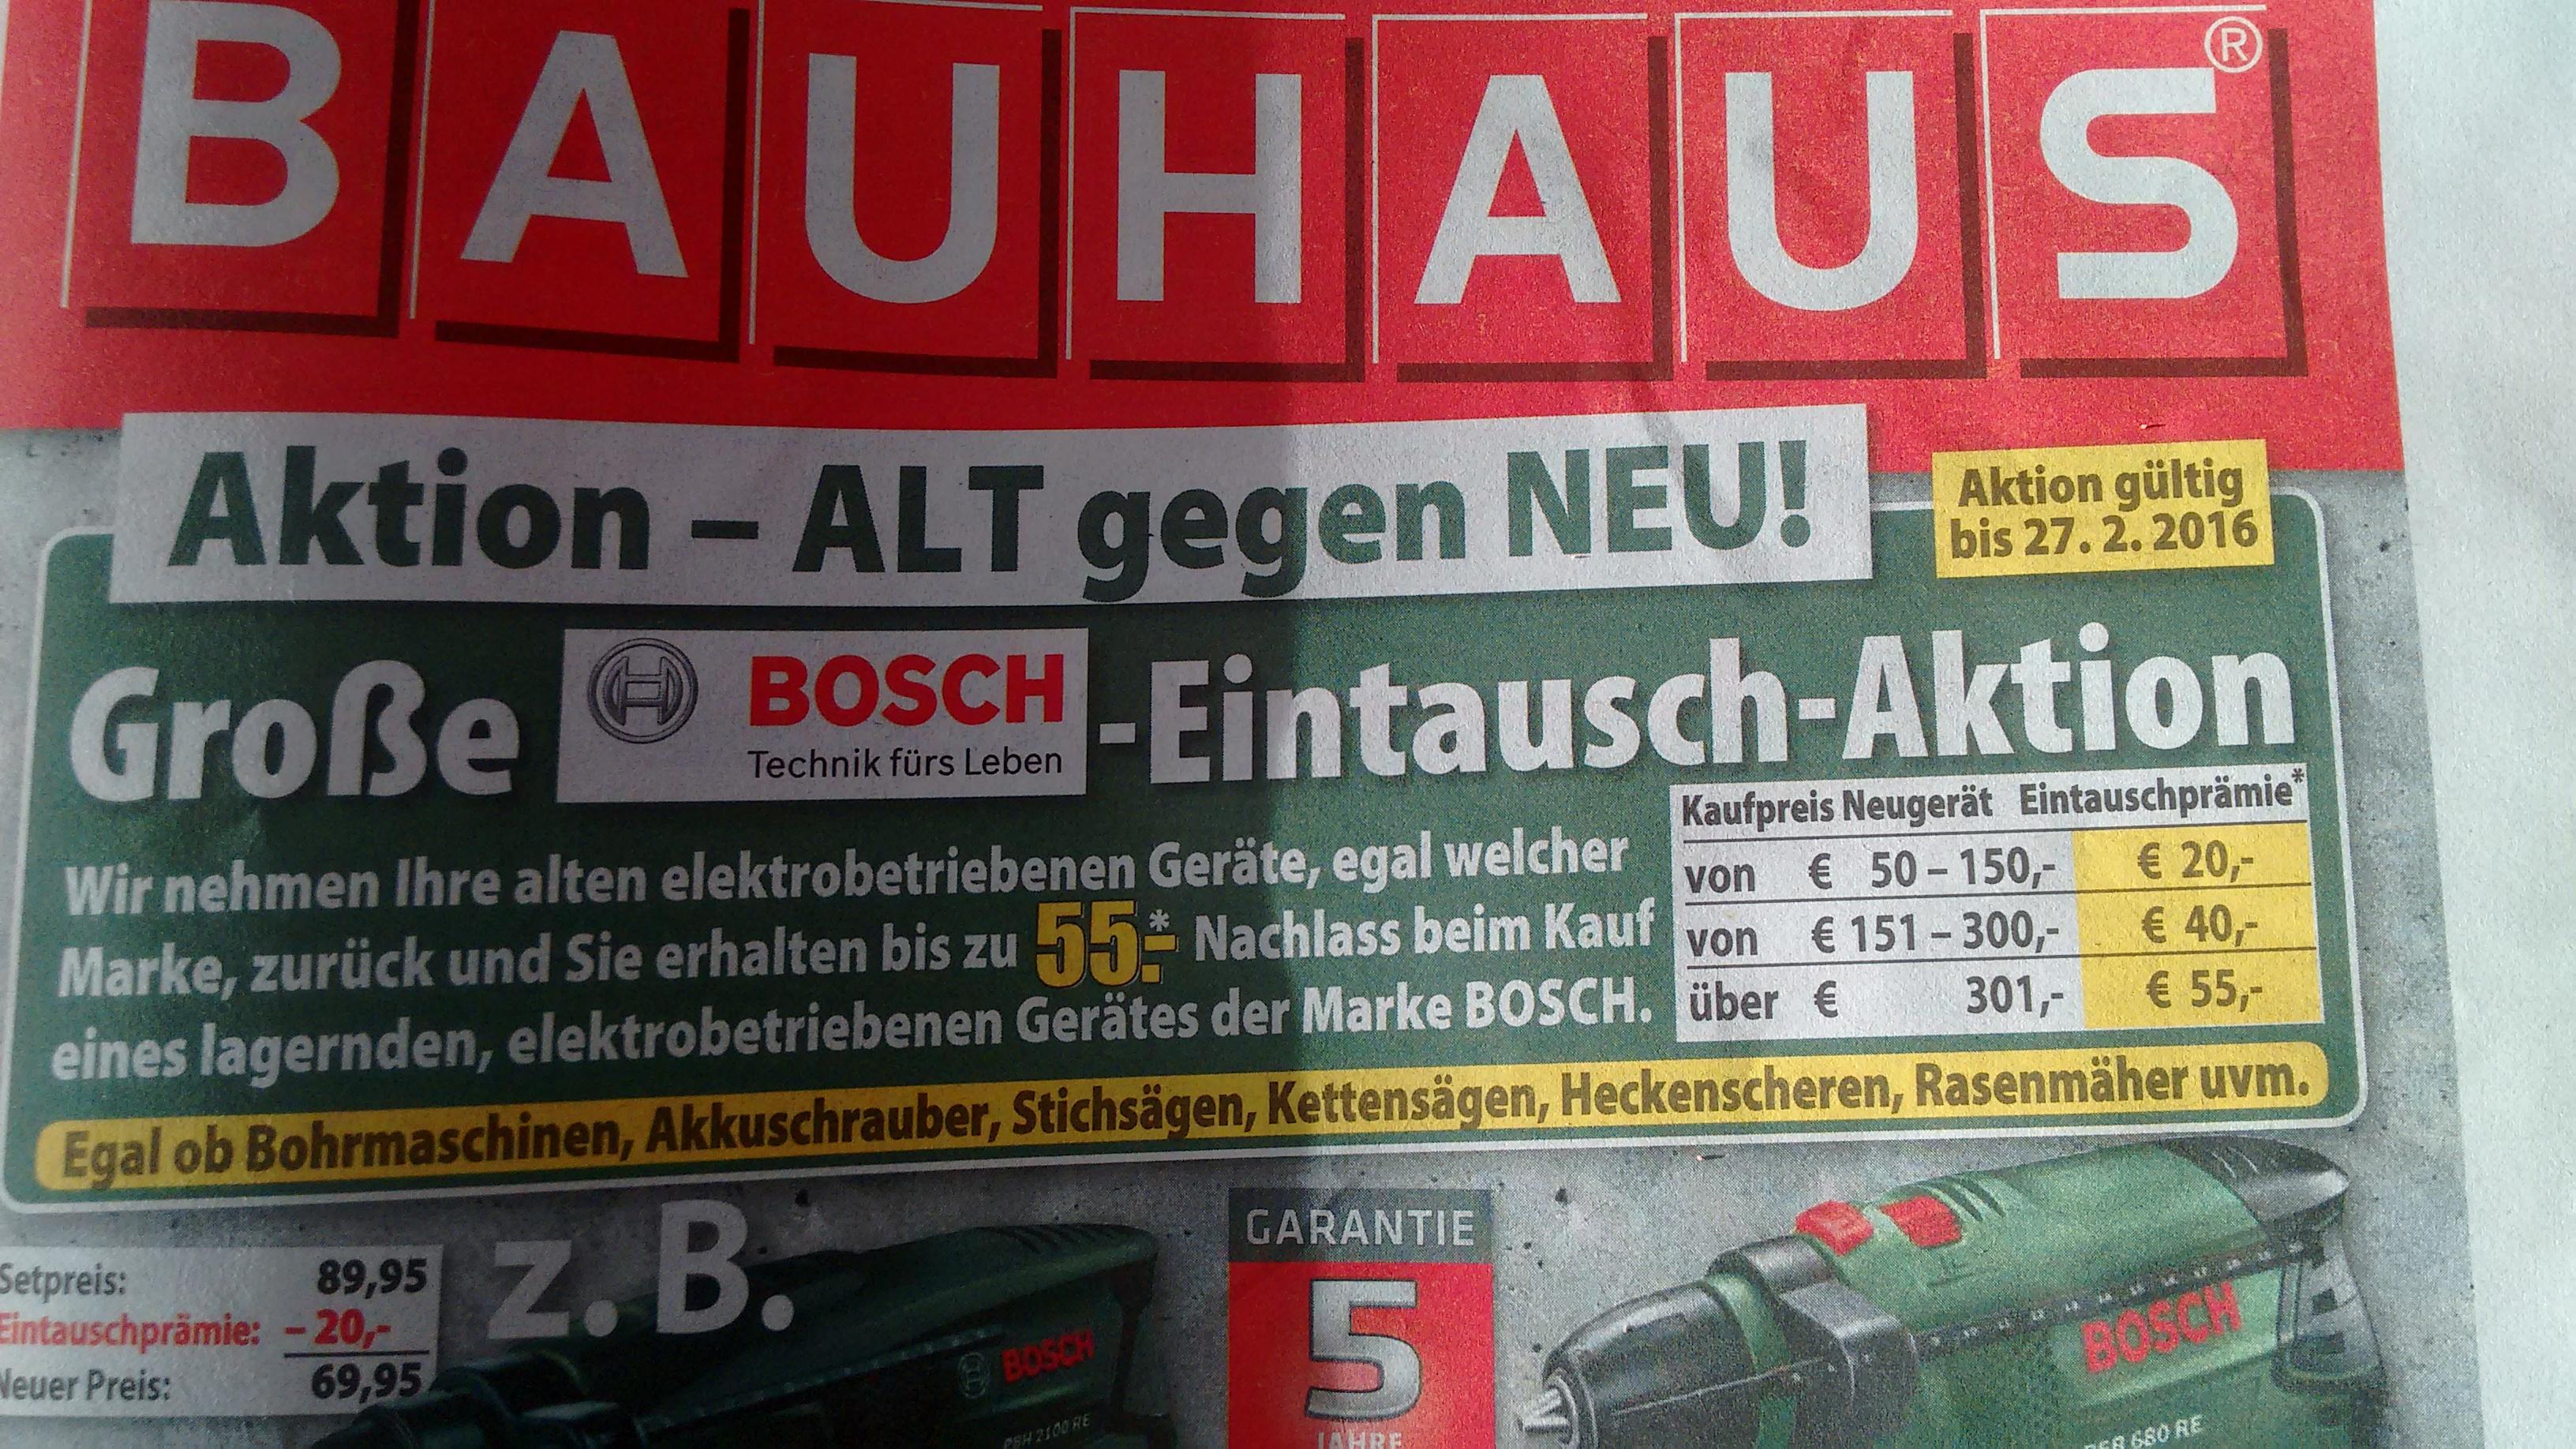 [Bauhaus] bis zu 55€ Rabatt auf Boschgeräte bei Rückgabe eines Altgeräts